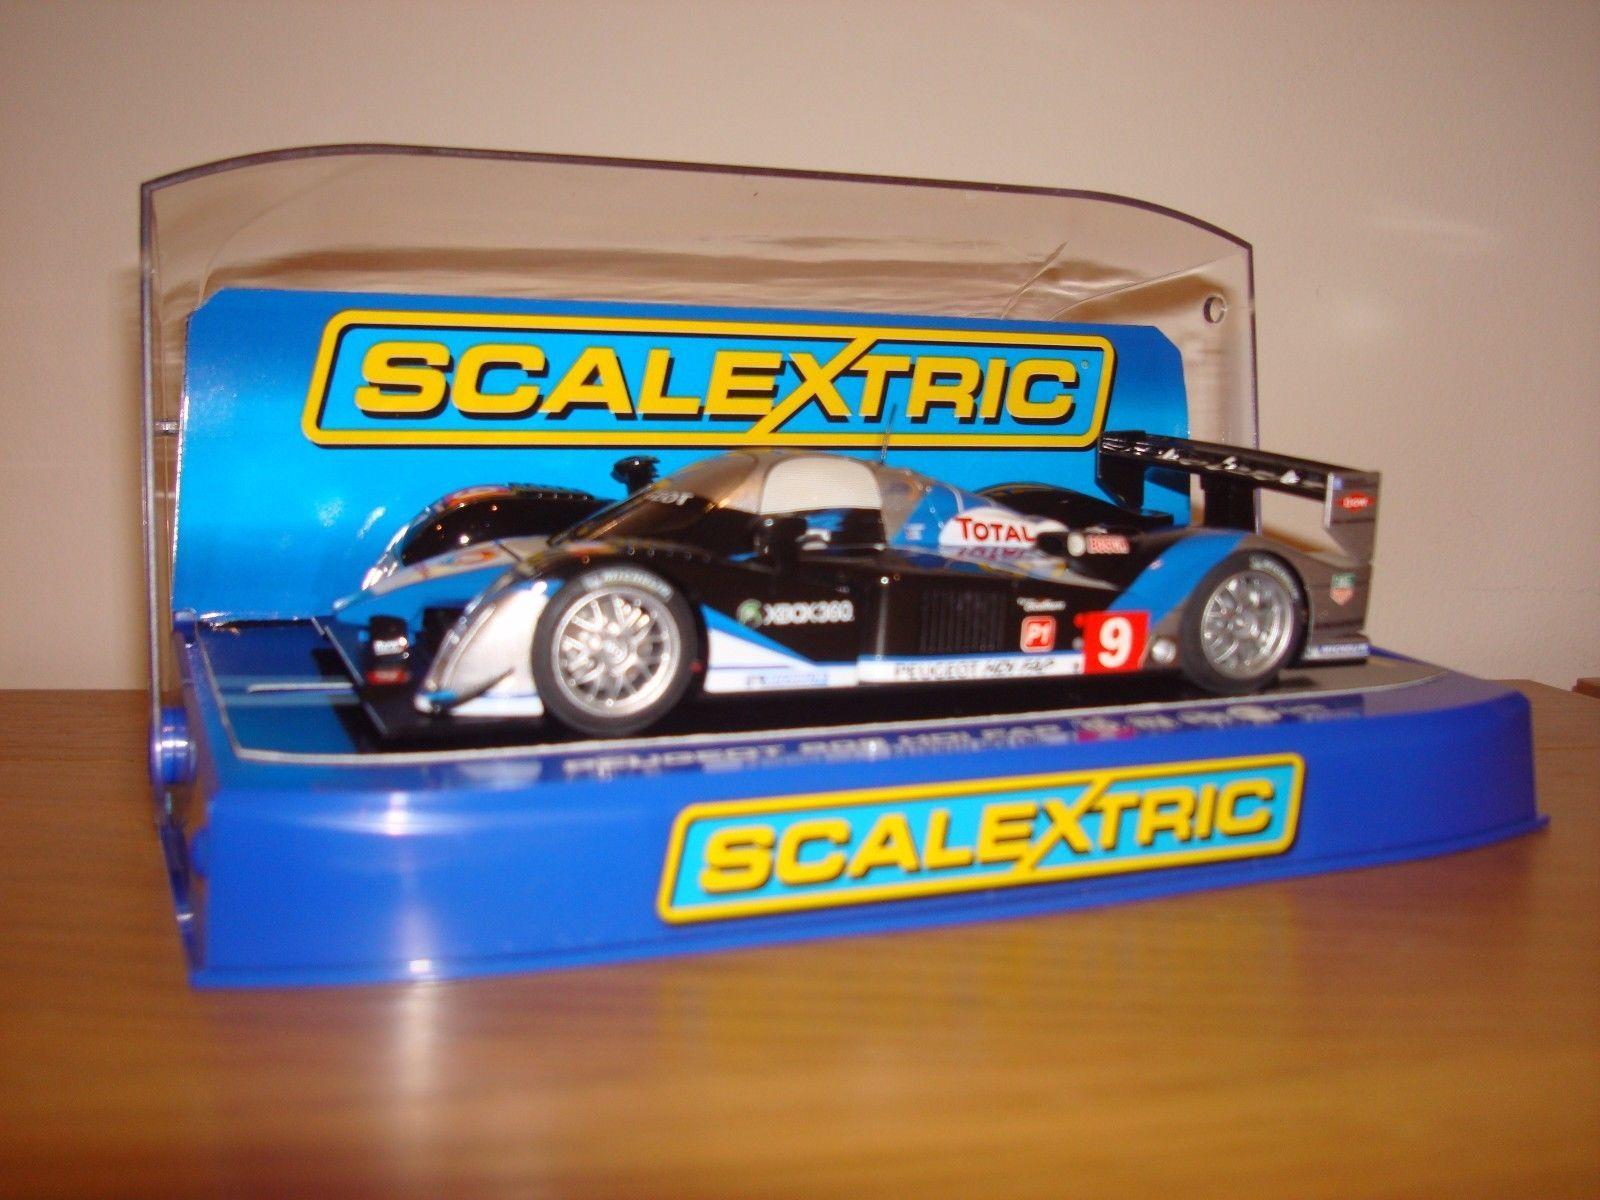 SCALEXTRIC C3011 PEUGEOT 908 HDI FAP 2009 #8 CAR - MINT BOXED CONDITION https://t.co/GiWDF356Ep https://t.co/duaS9jE6mo